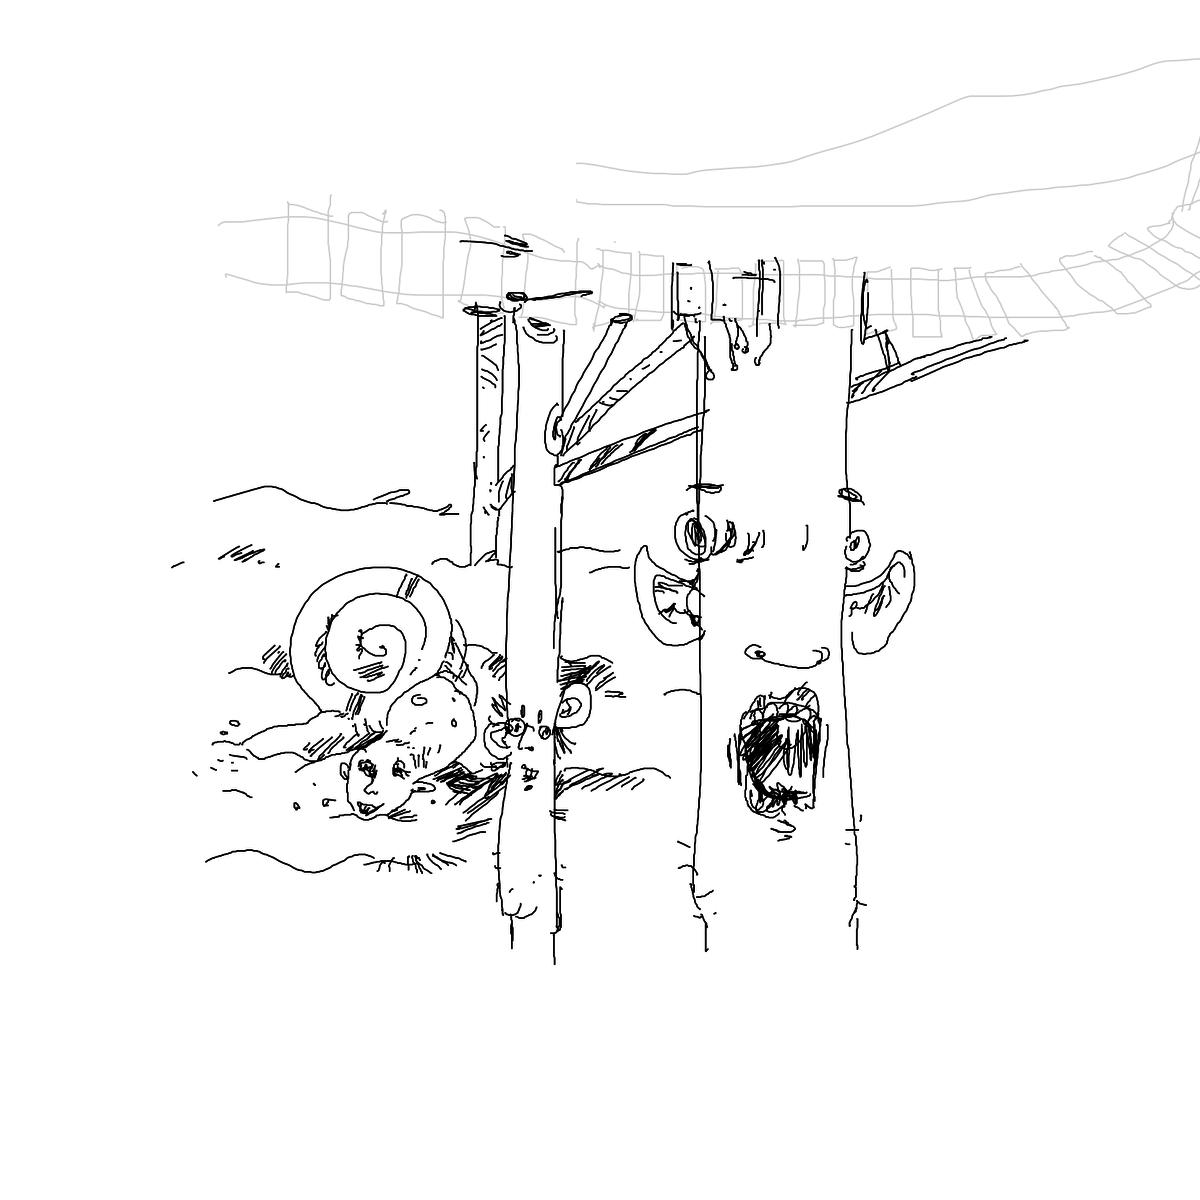 BAAAM drawing#18097 lat:78.4207382202148400lng: -4.4903974533081055